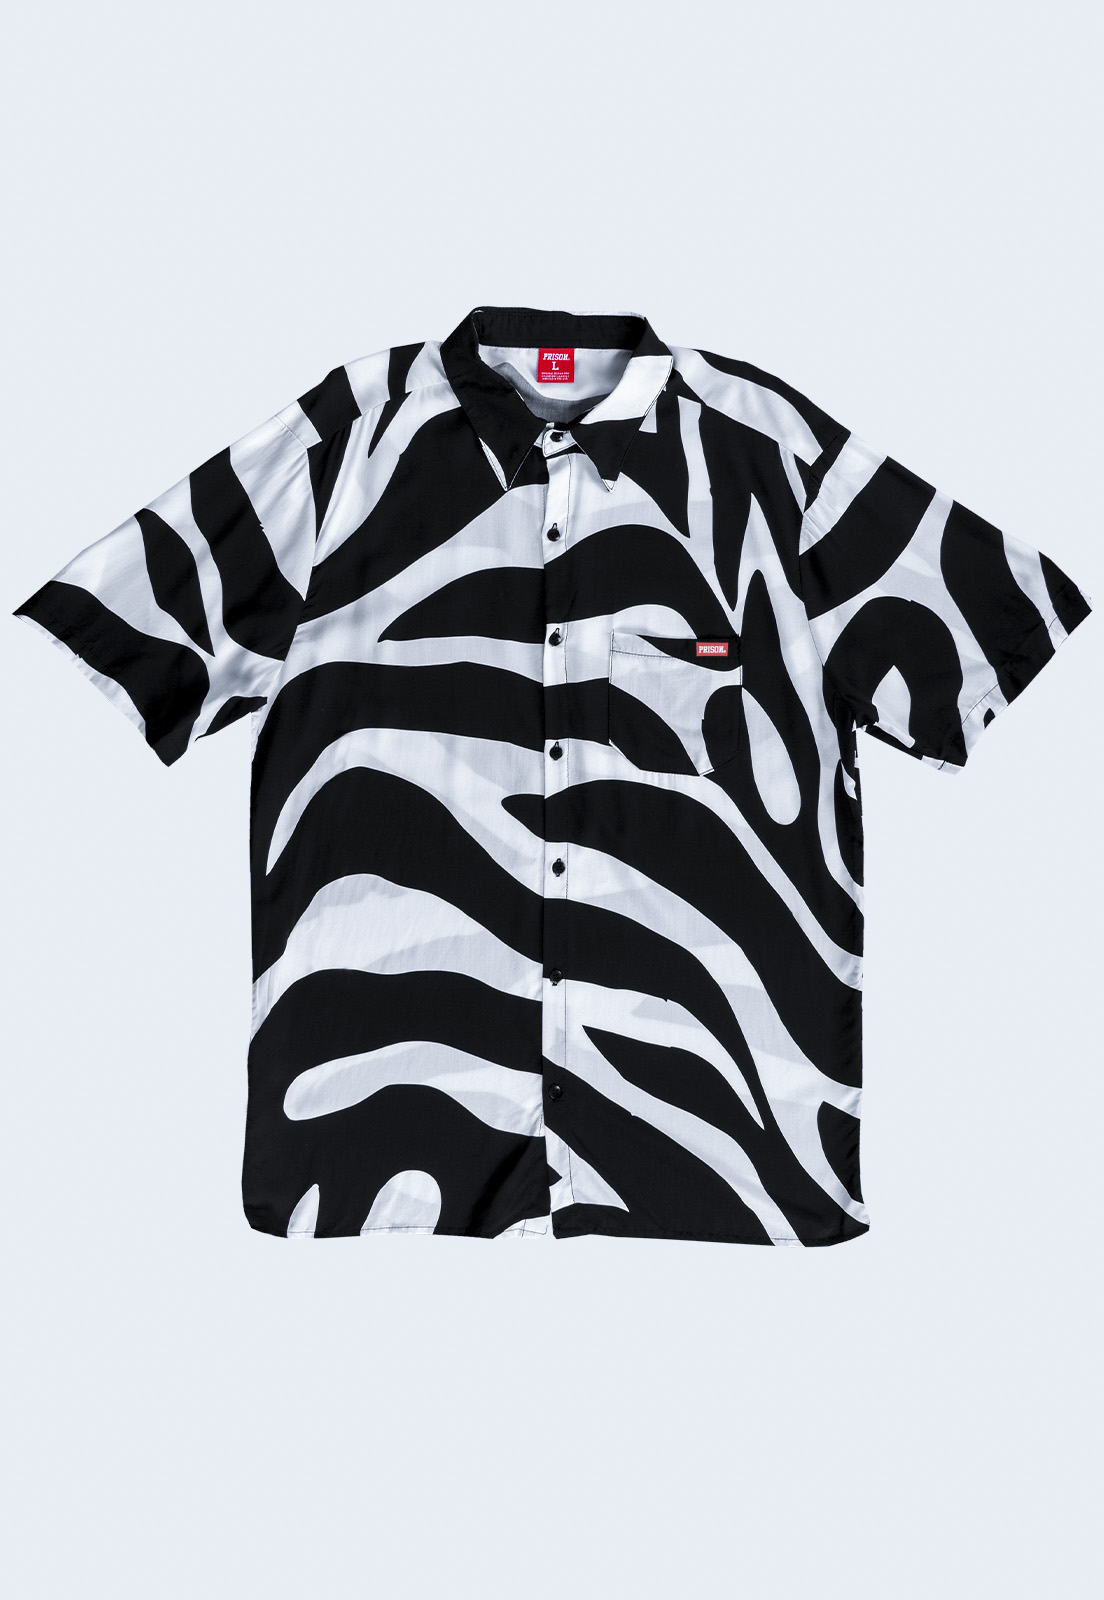 Camisa social Prison Black and White